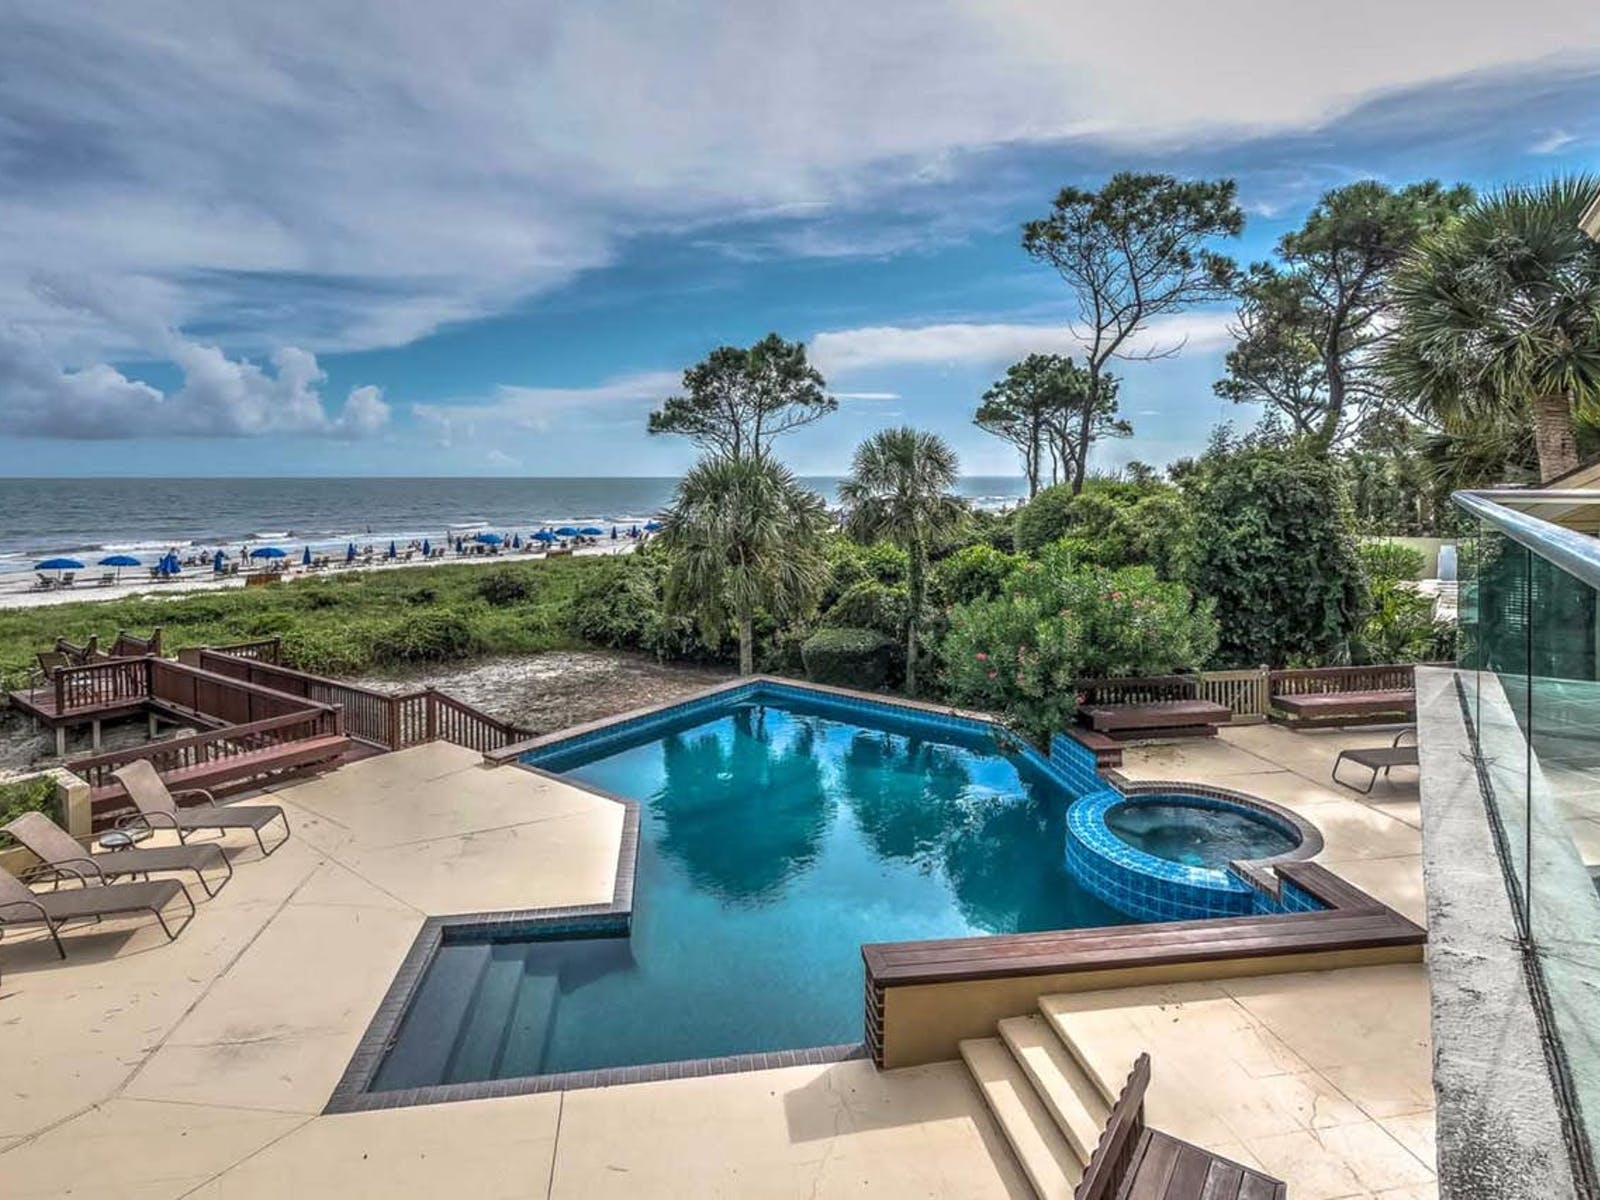 5 Oceanfront Hilton Head Vacation Rentals with Pools  Vacasa